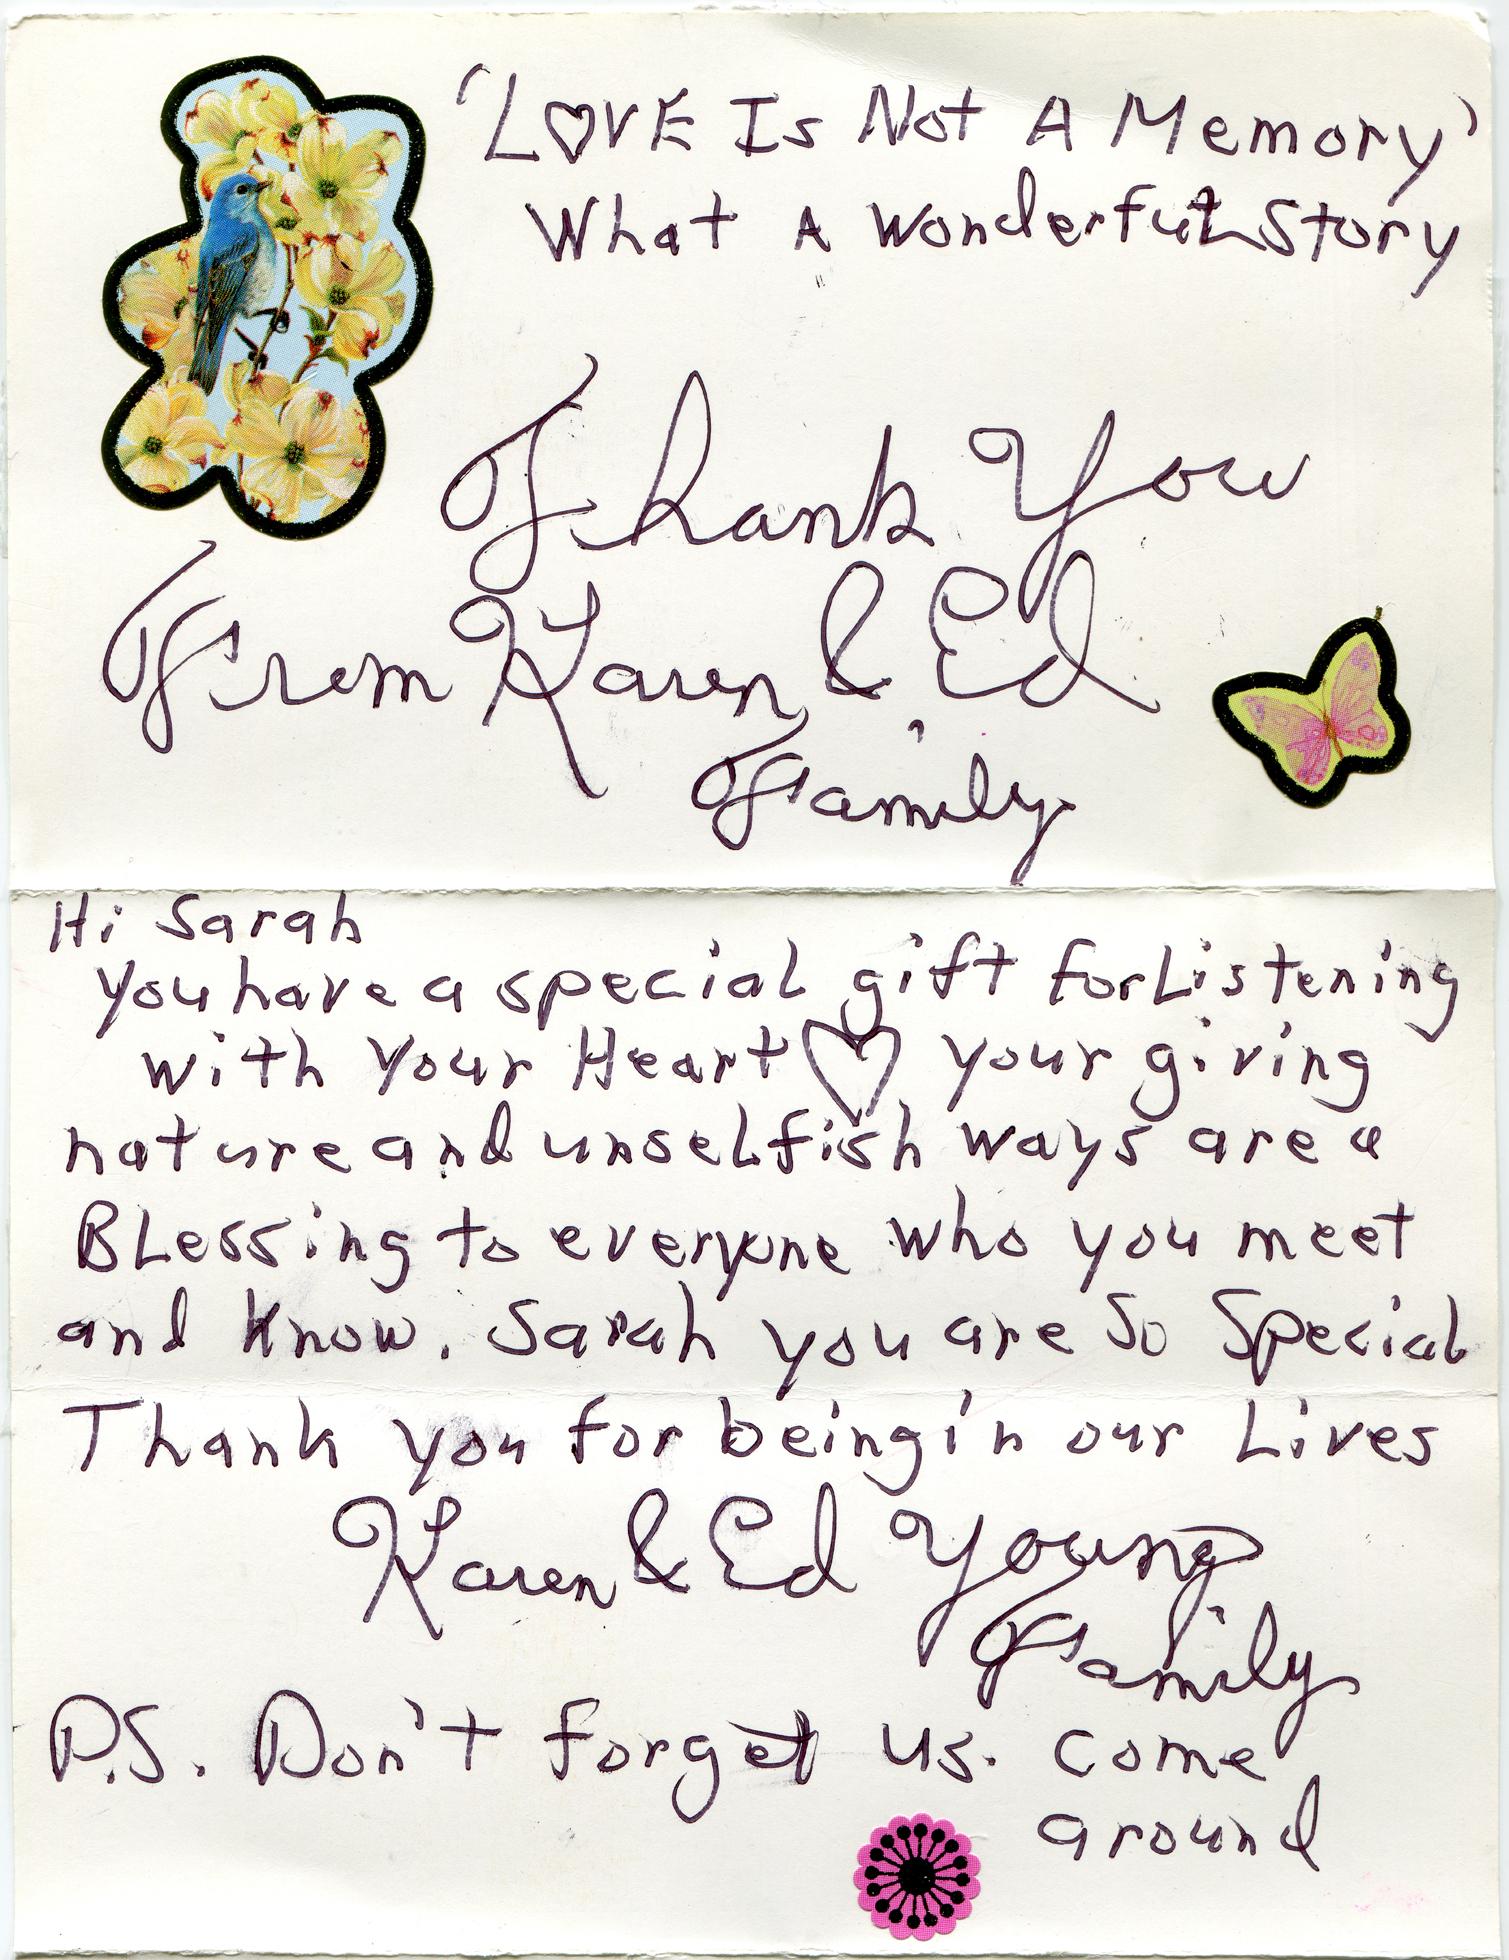 handwritten note from Ed